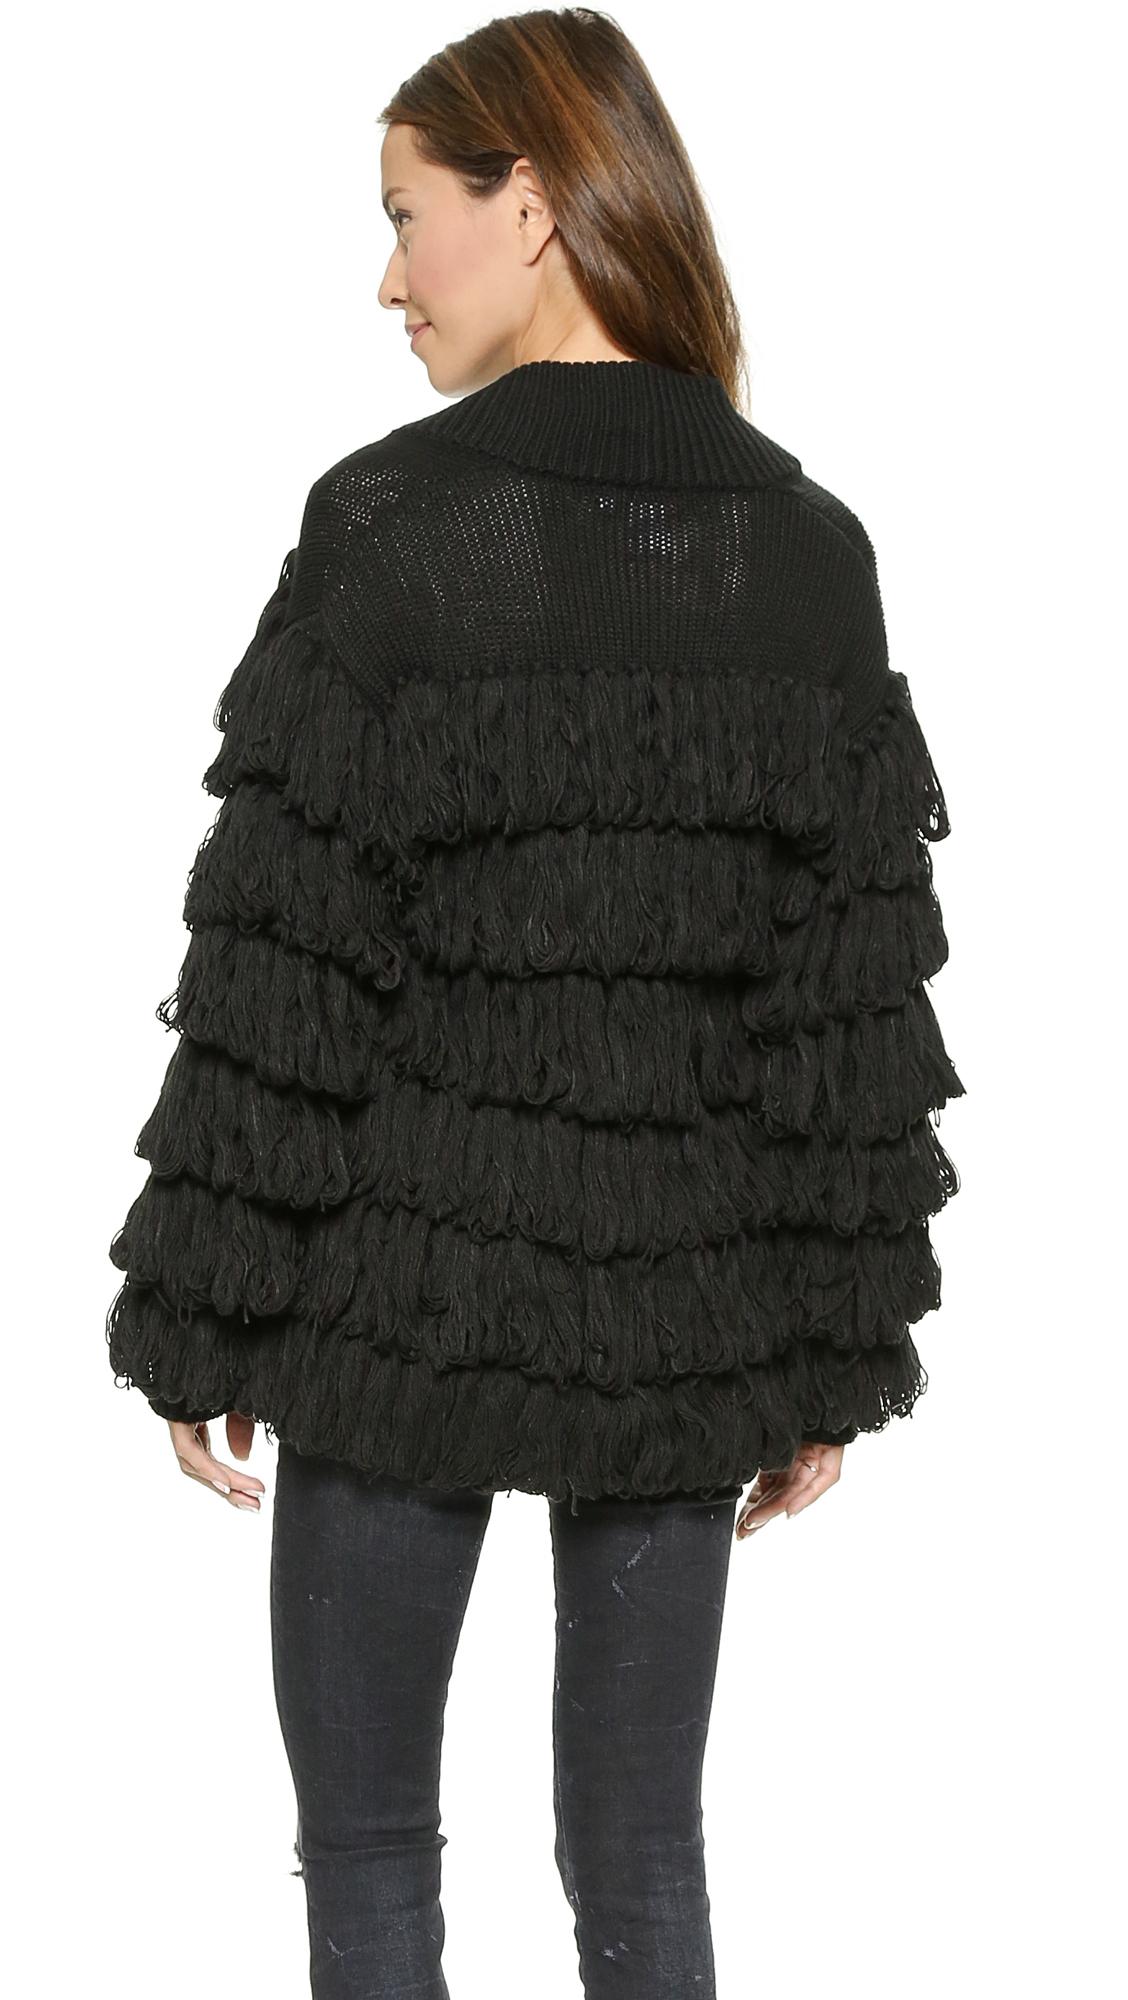 Images of Black Sweater Coat - Reikian